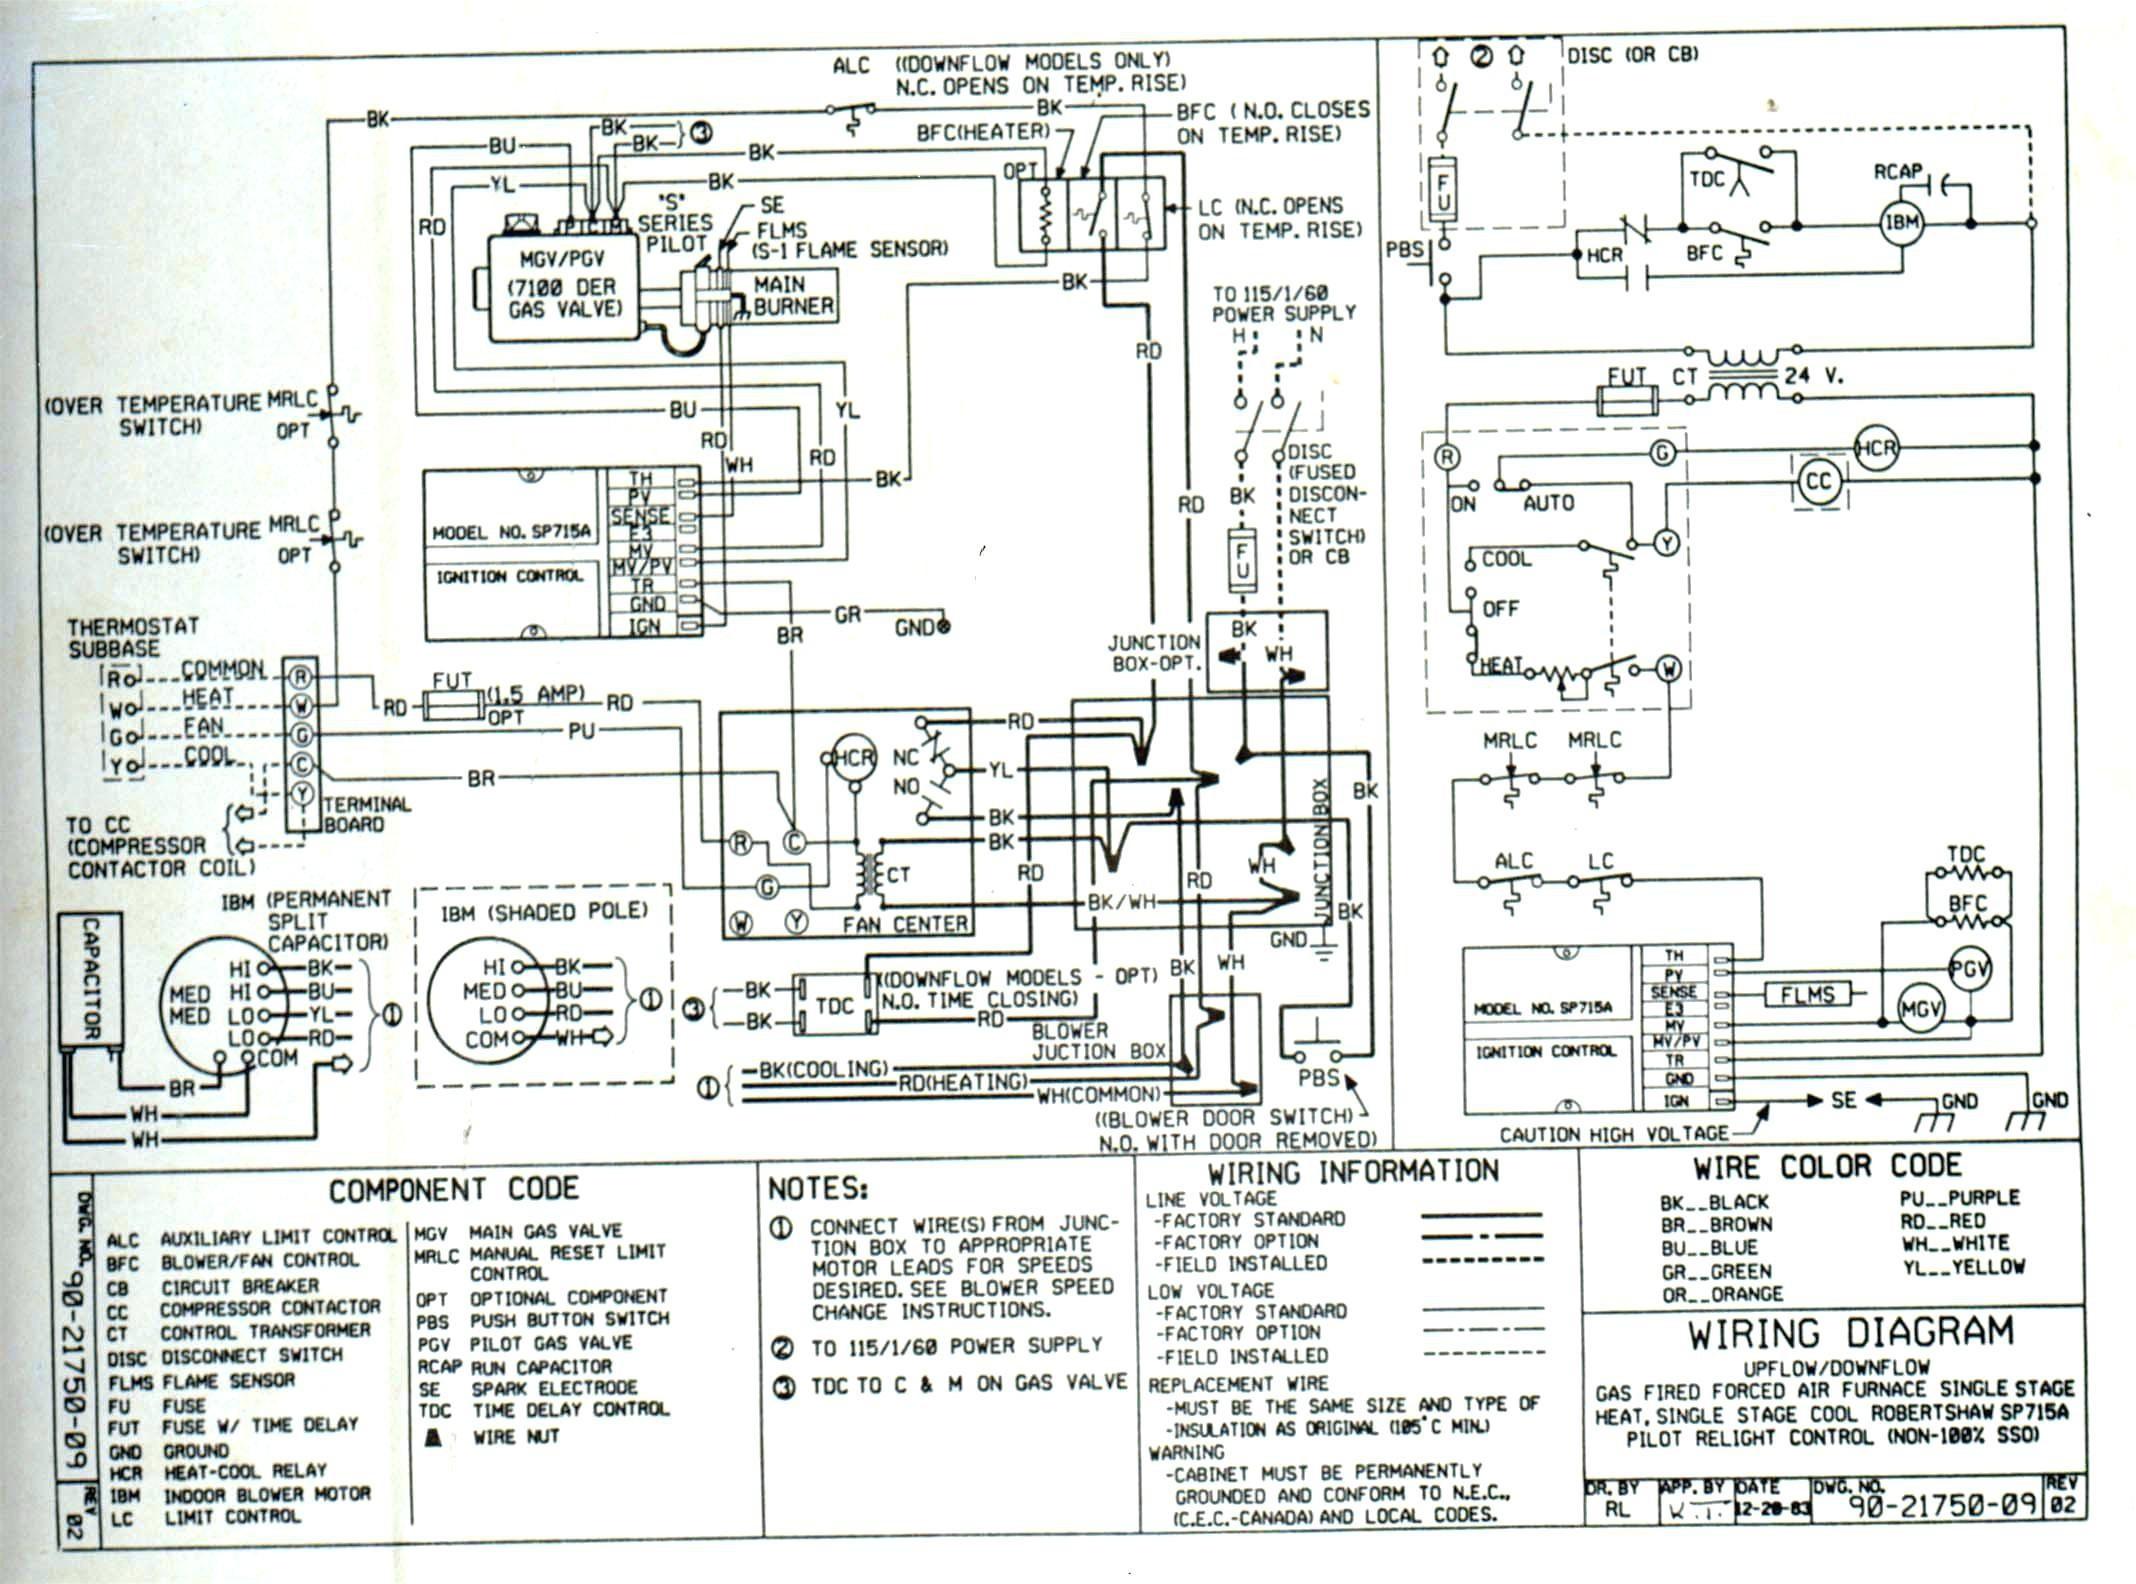 trane xl1200 wiring diagram new wiring diagram image rh mainetreasurechest com Trane Commercial Wiring Diagrams Trane Wiring Diagrams Model